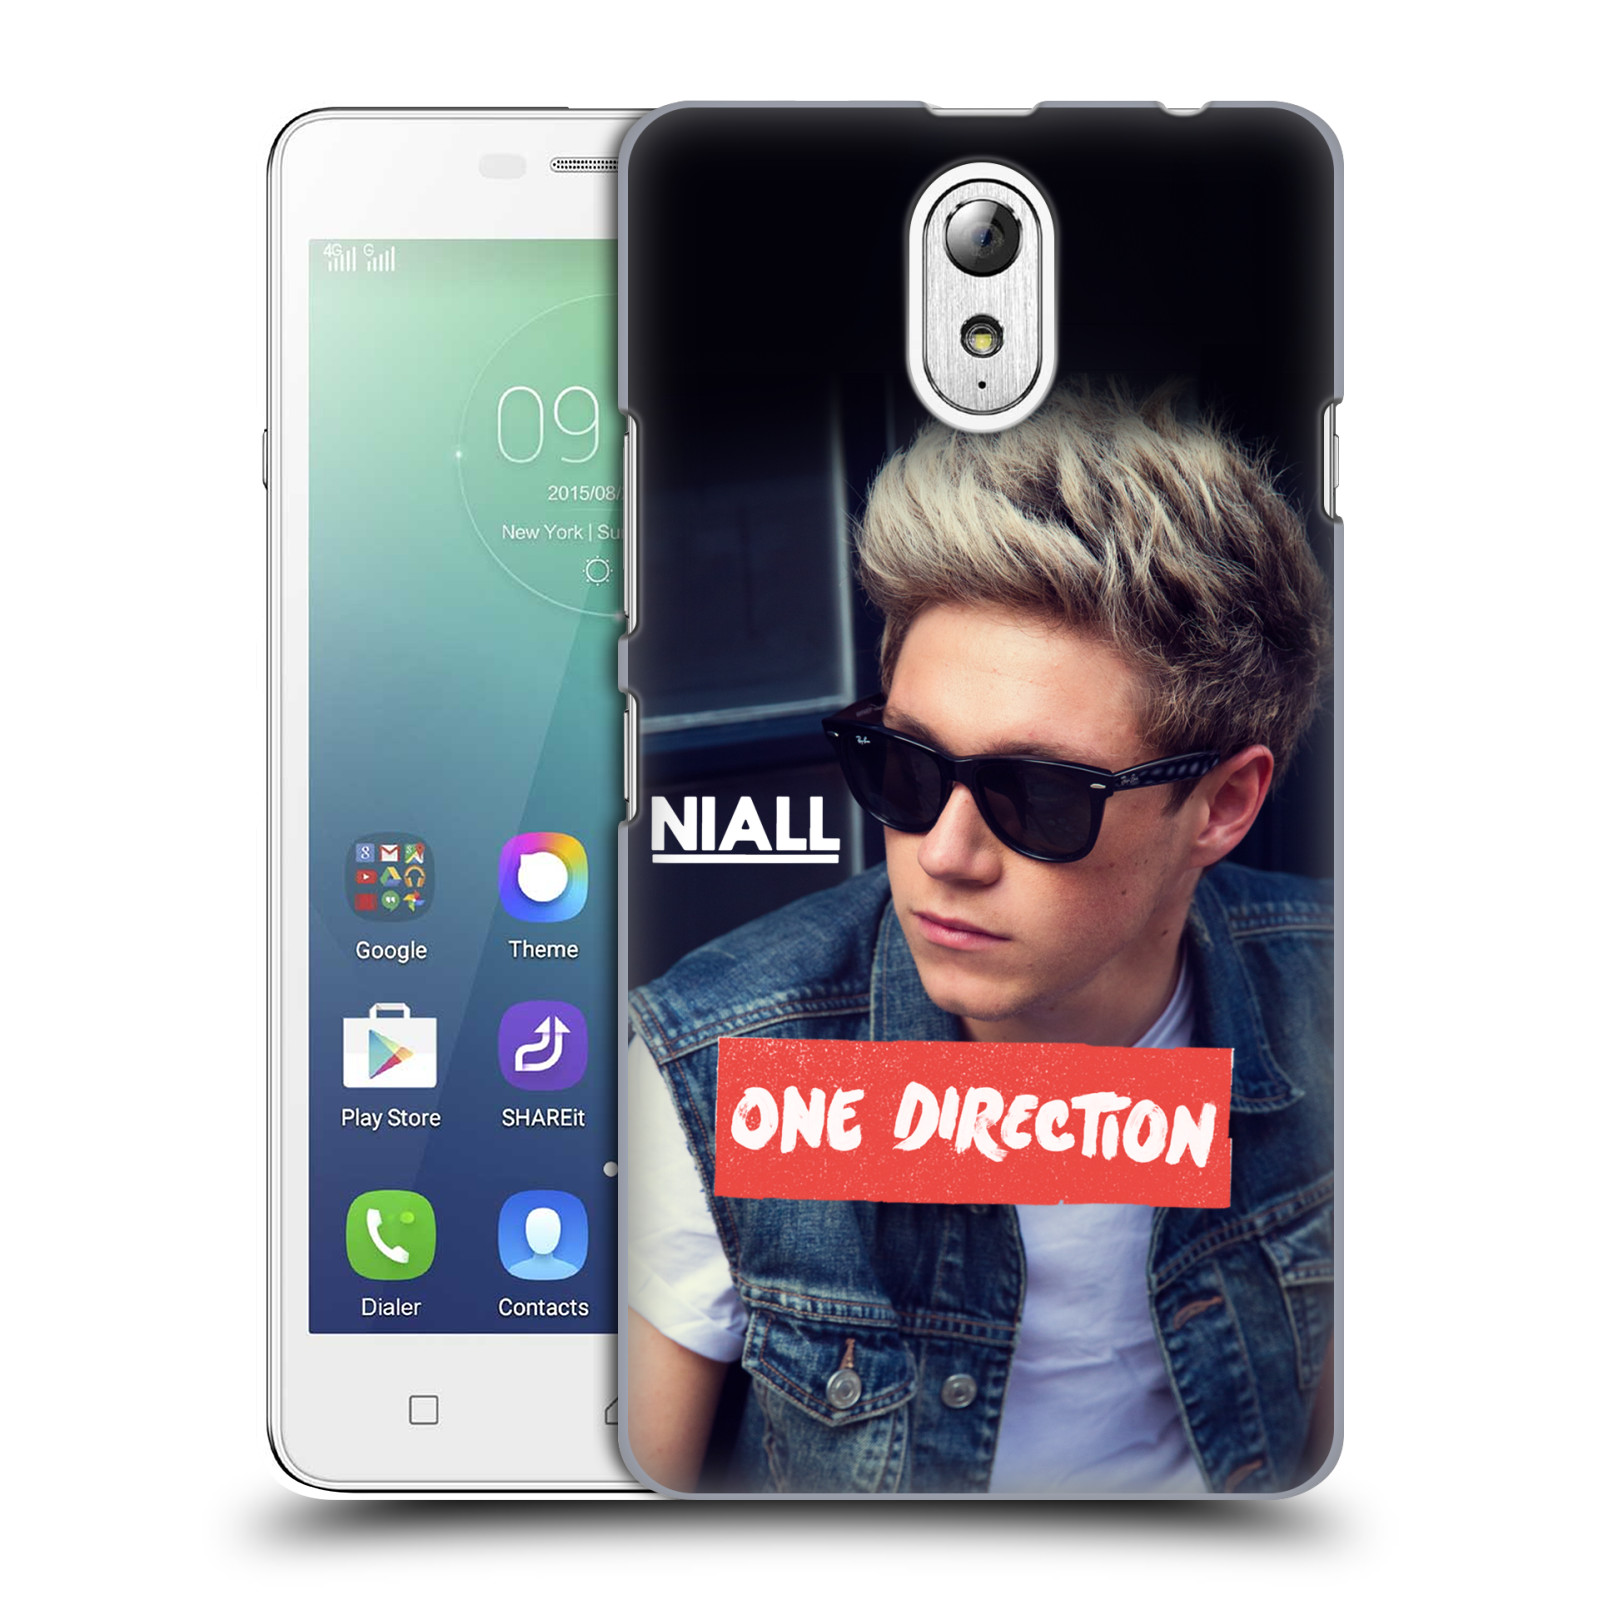 Plastové pouzdro na mobil Lenovo Vibe P1m HEAD CASE One Direction - Niall